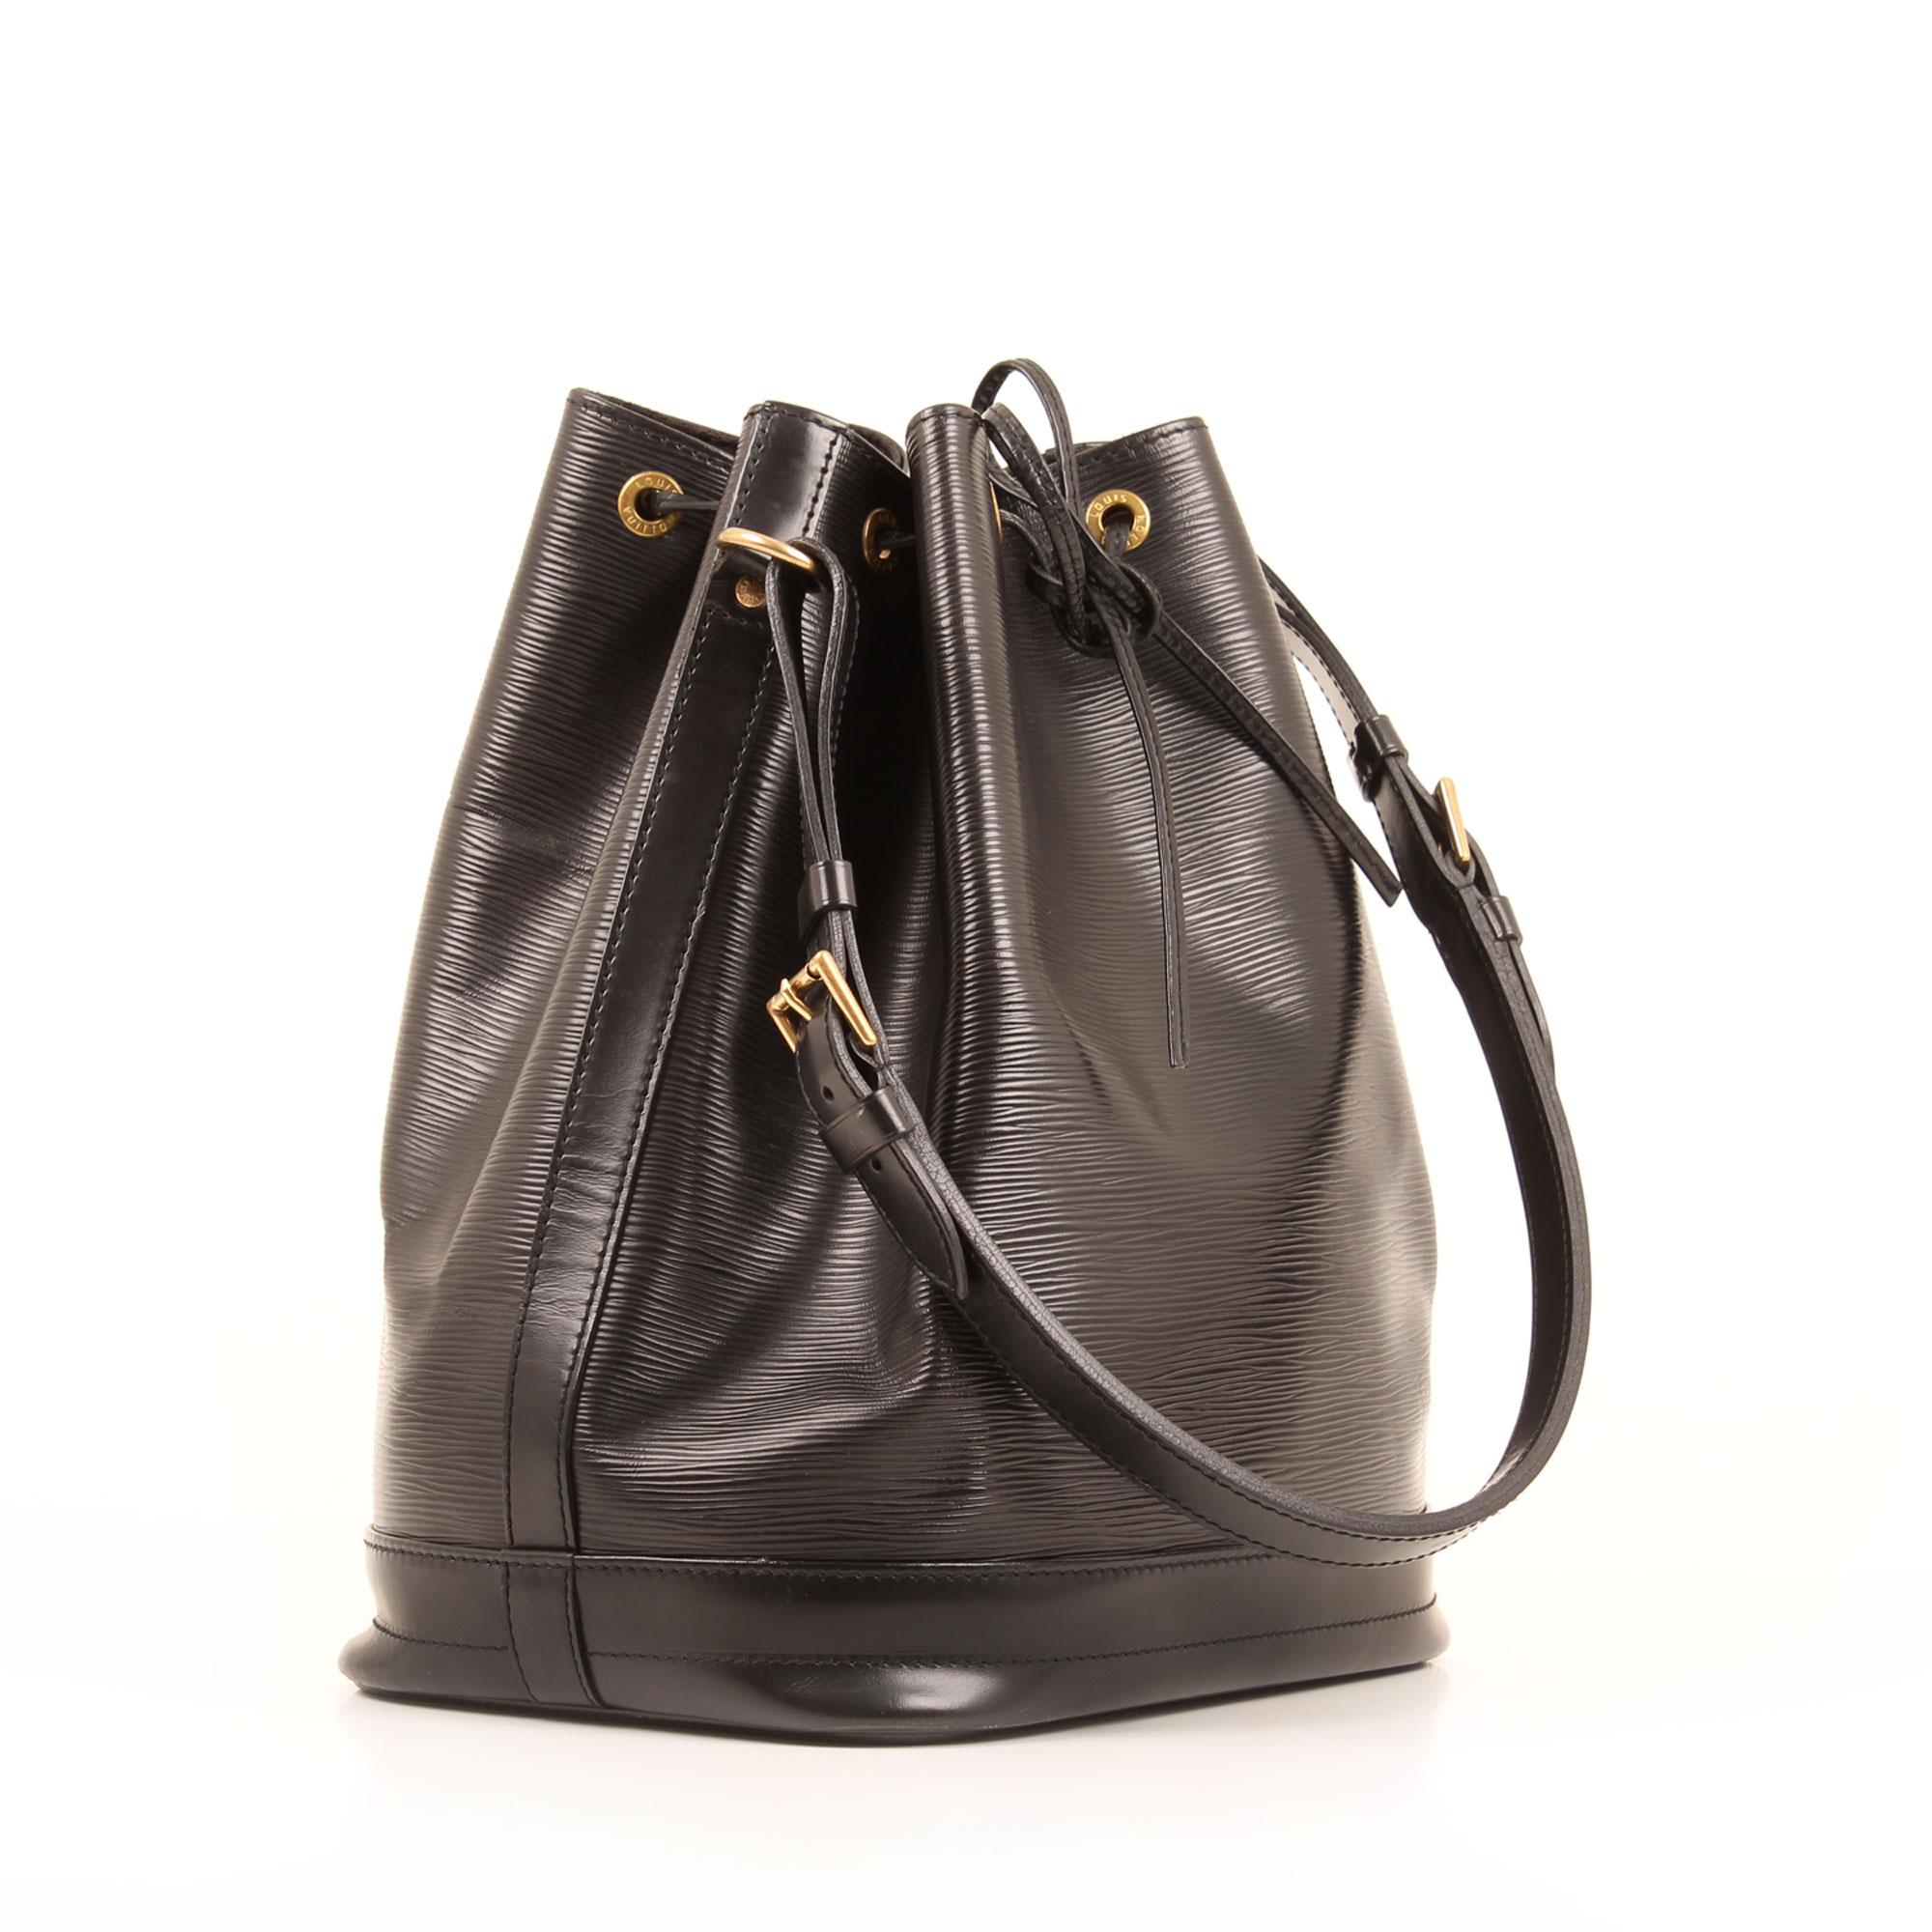 Imagen general del bolso louis vuitton bolso noe epi negro